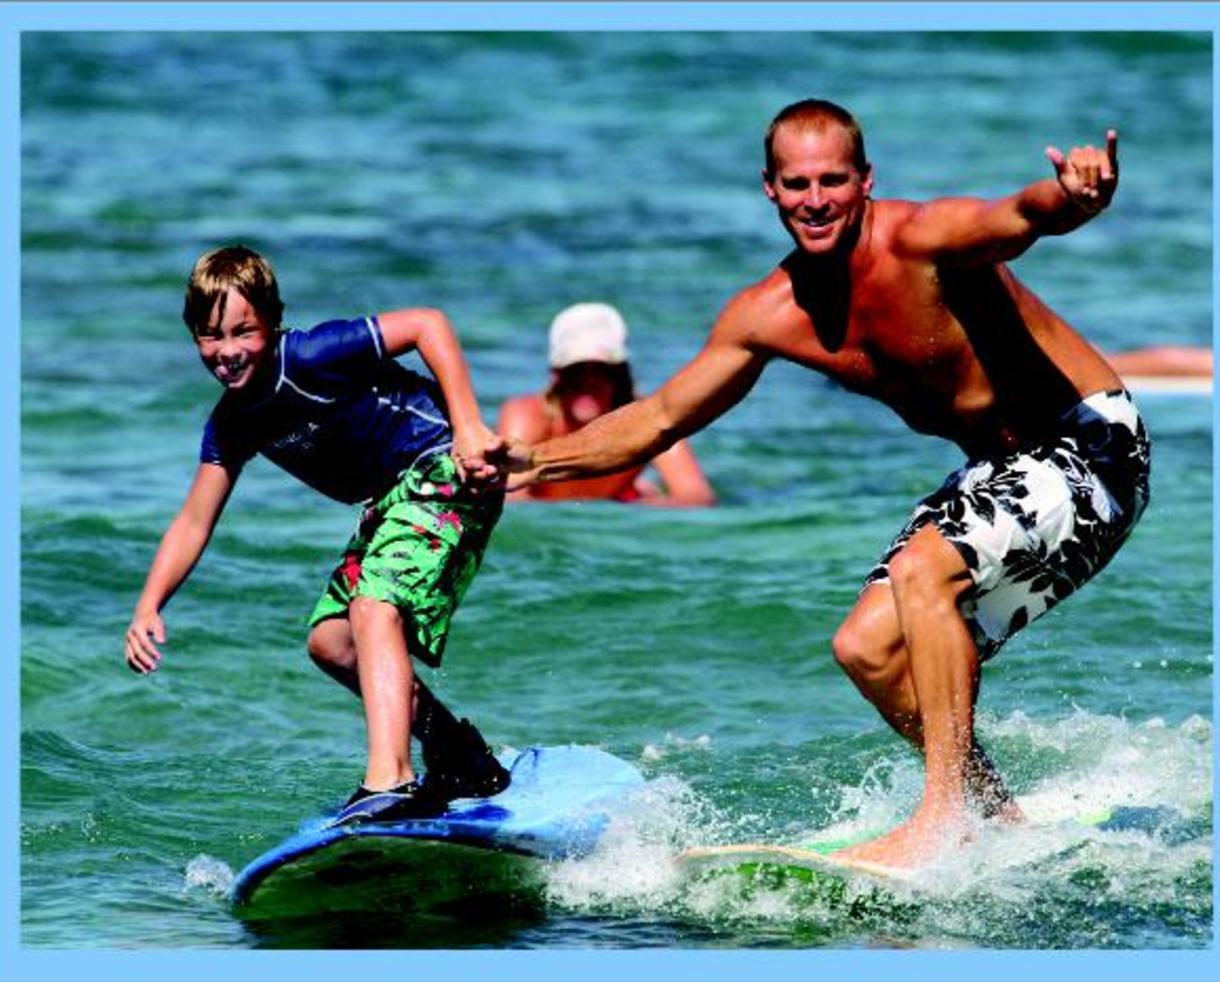 Surf camp deals